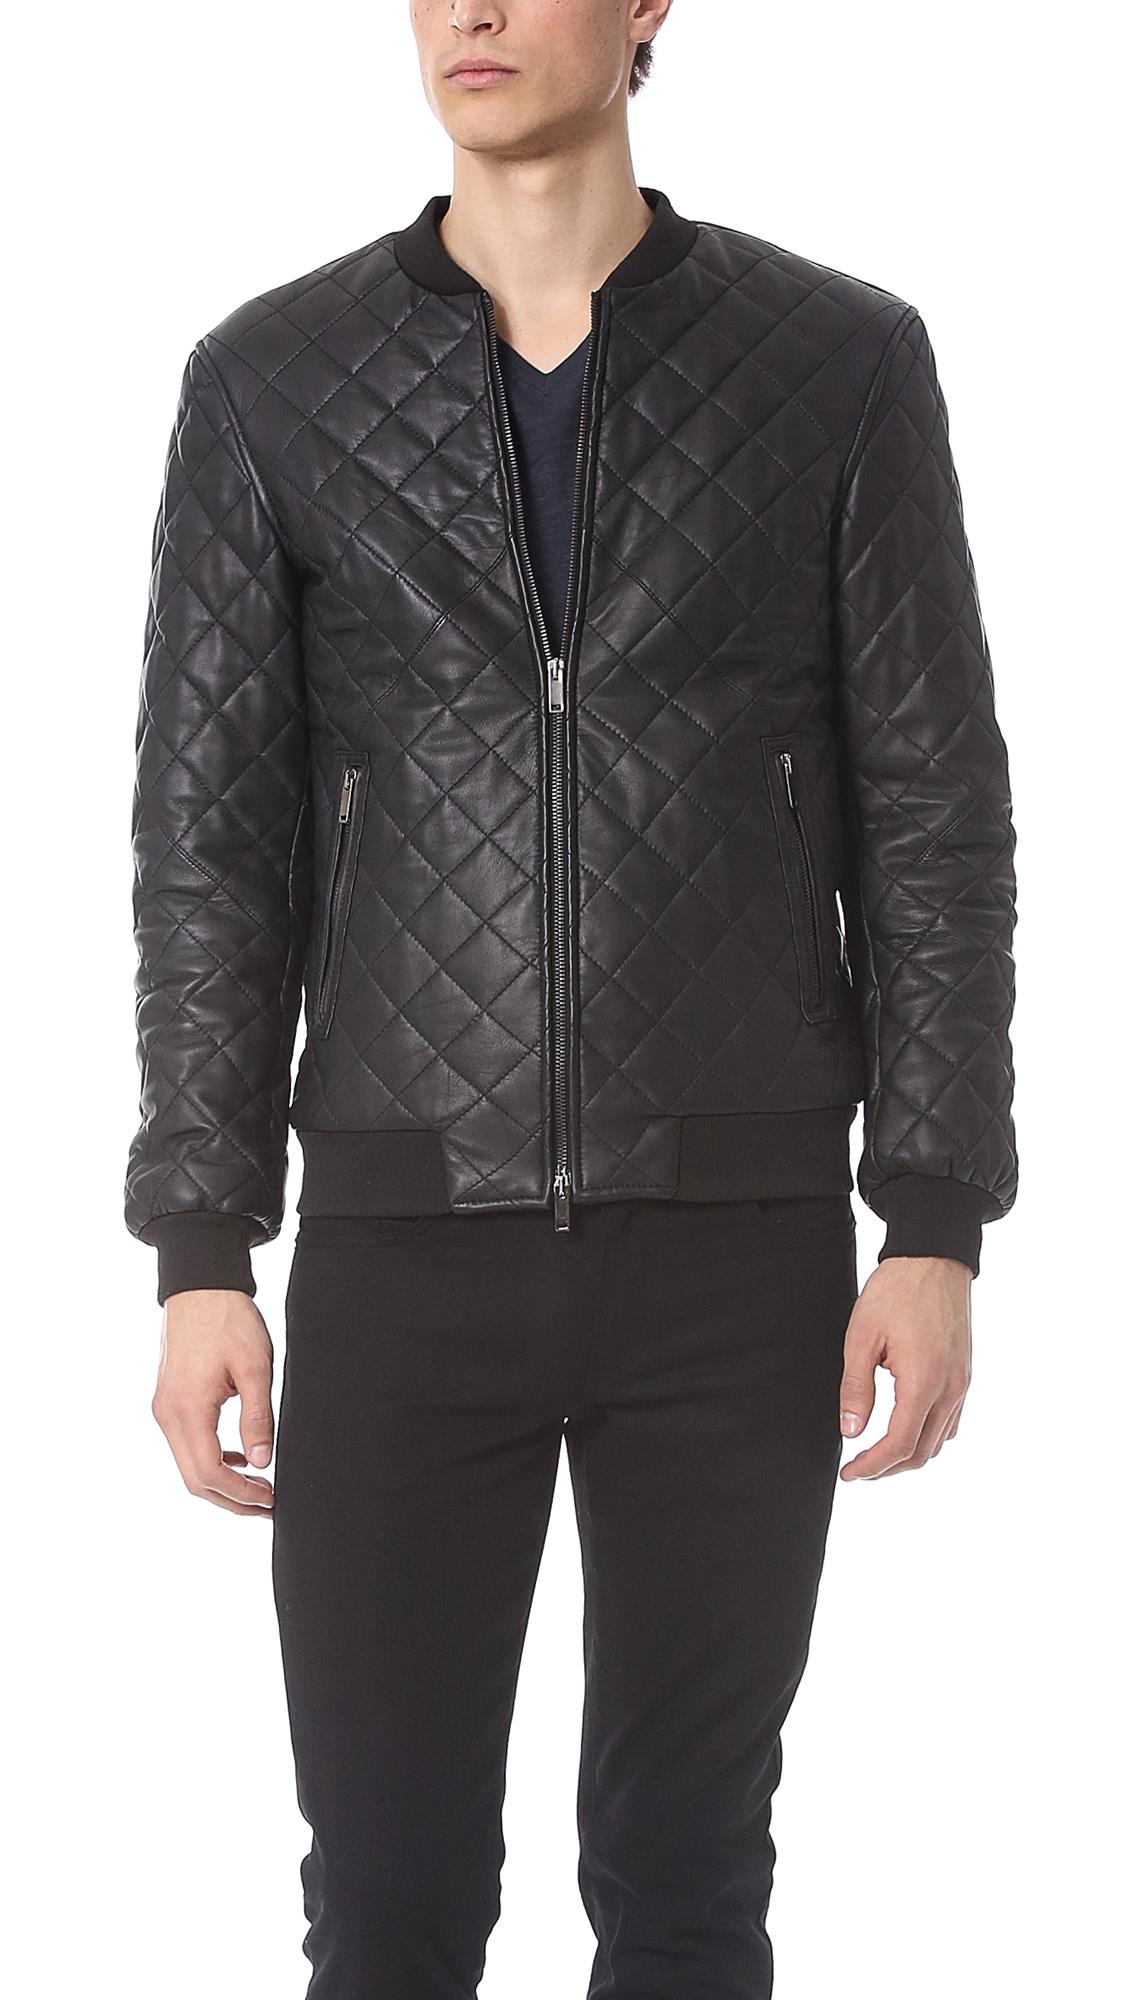 Lyst Lot78 Leather Bomber Jacket In Black For Men